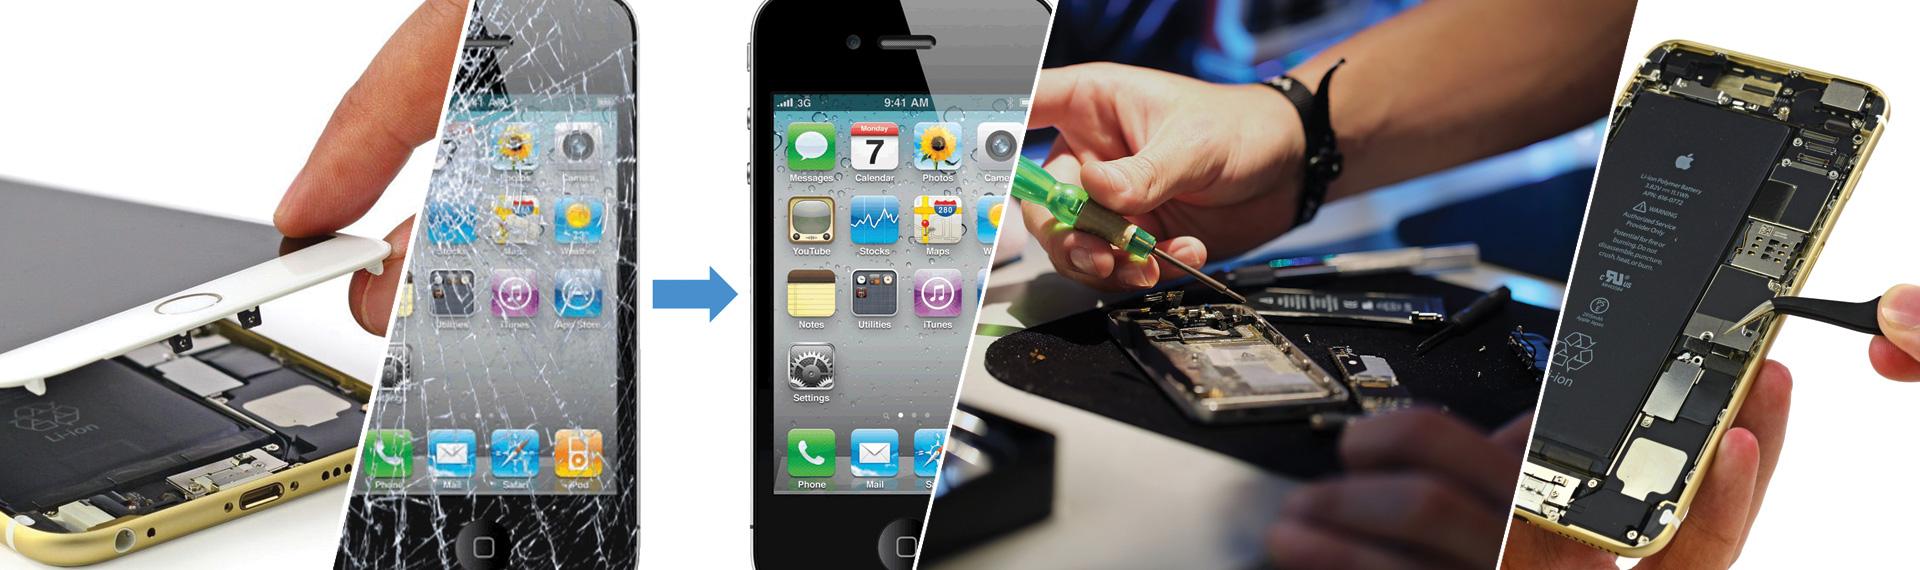 GPS Mobile Repair Addison TX